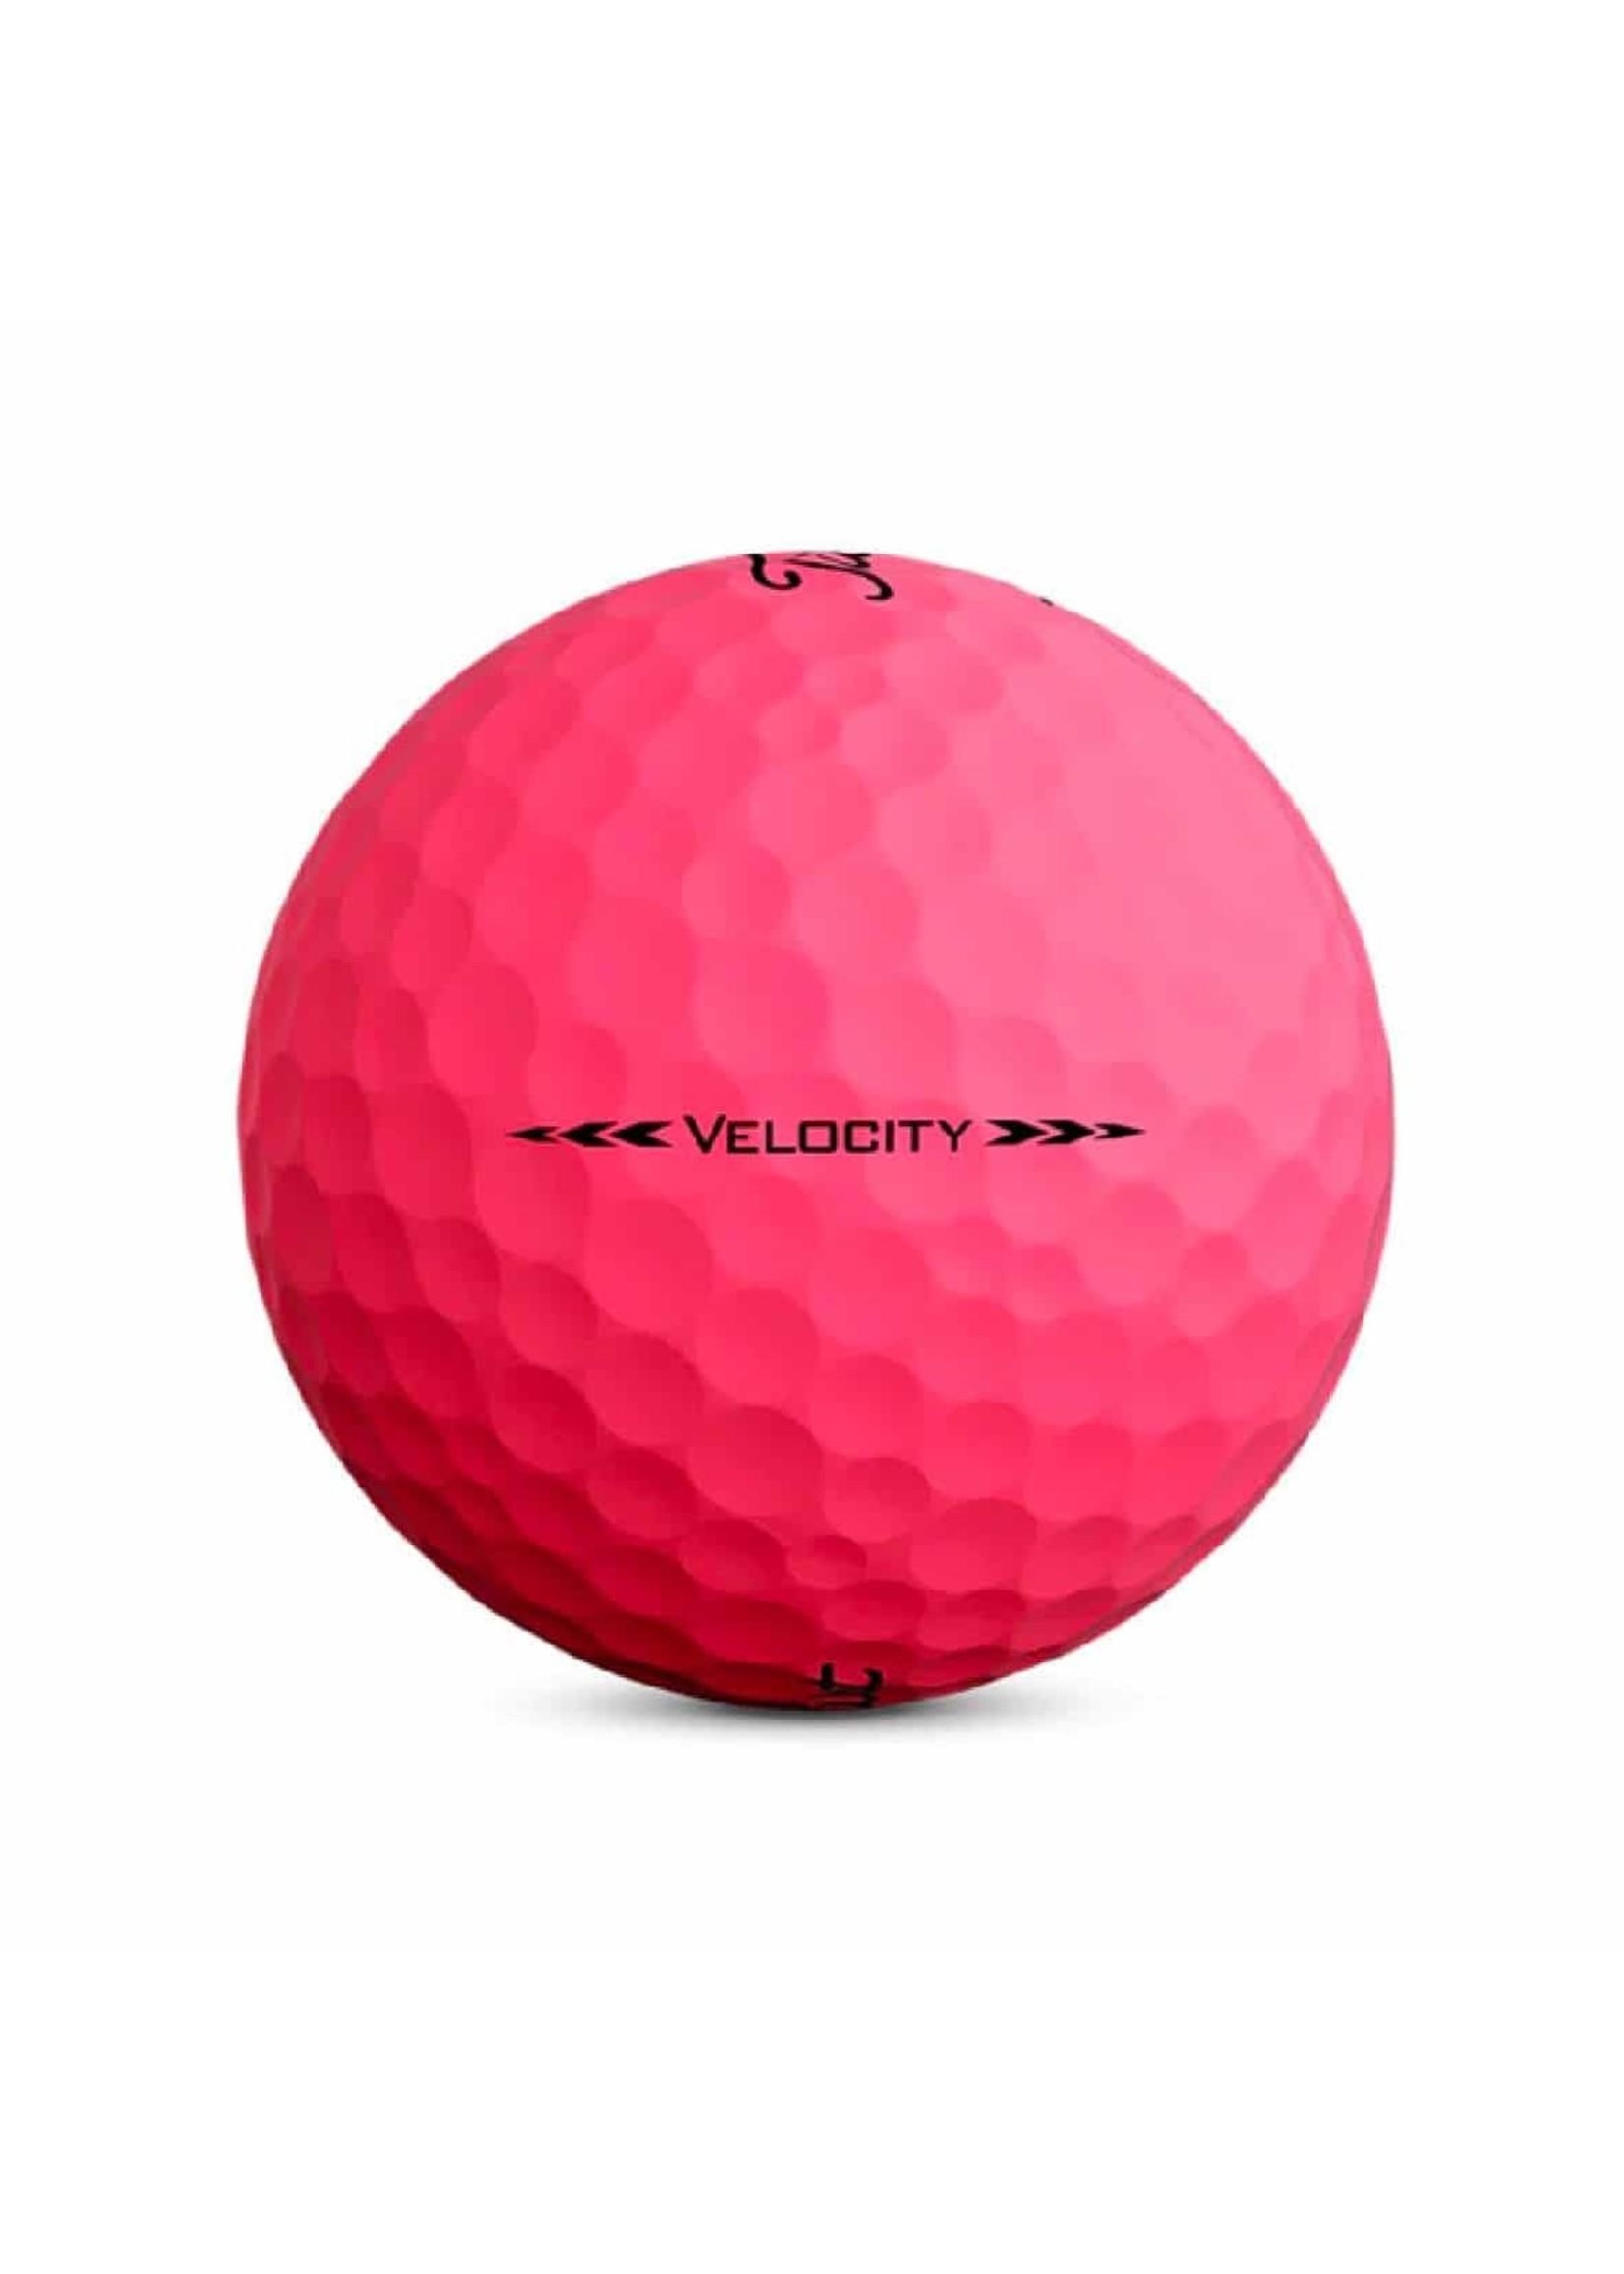 Titleist Titleist Velocity Golf Ball, Sleeve of 3, Pink (2020)